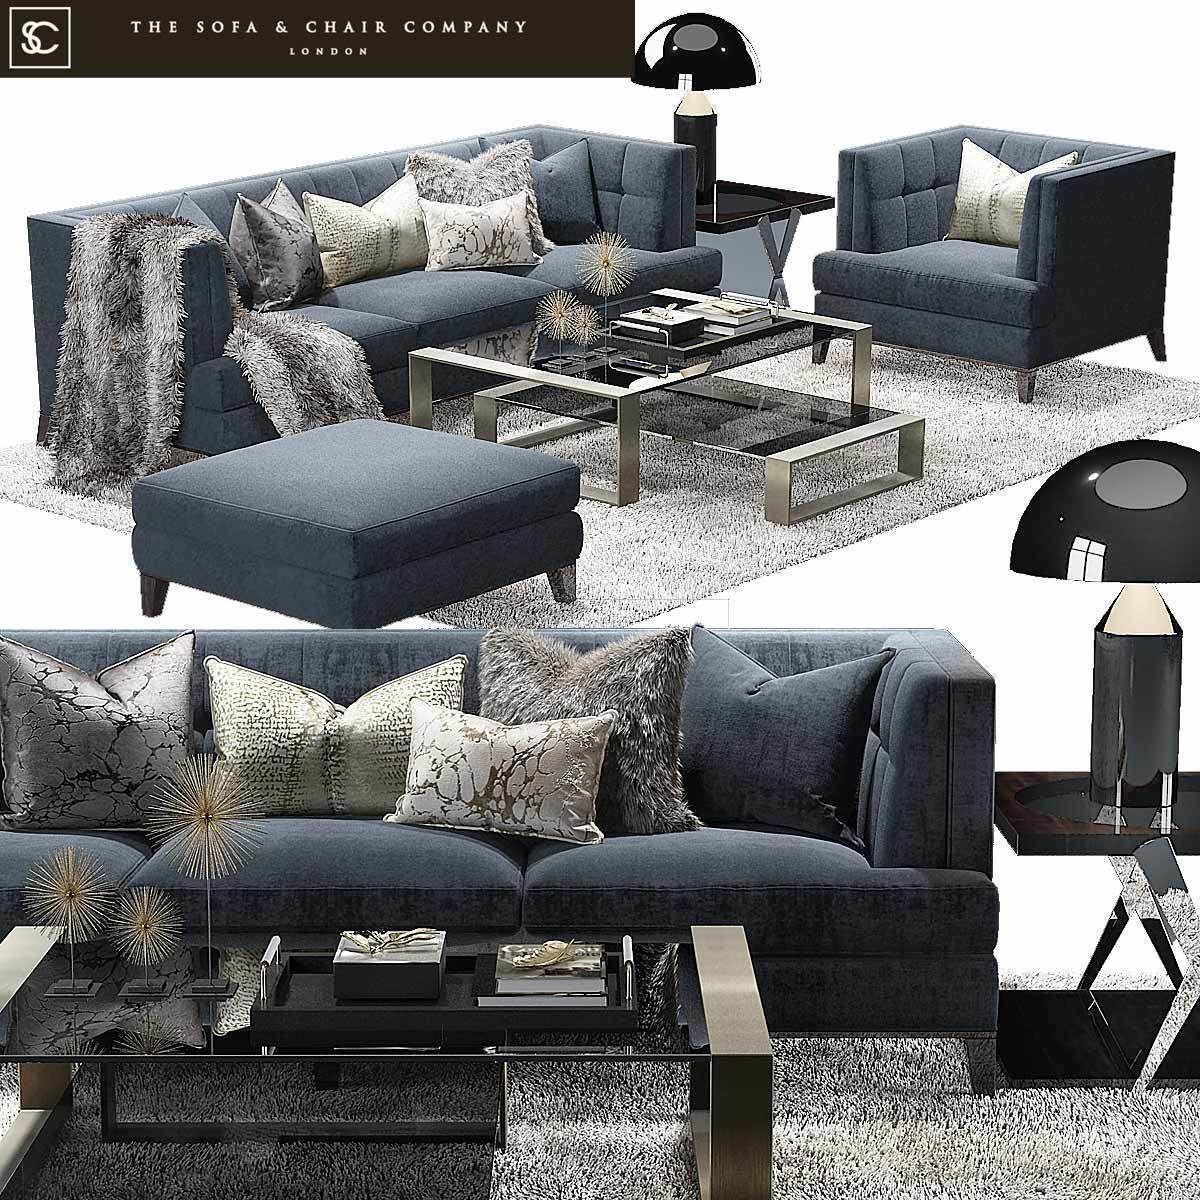 Strange The Sofa And Chair Company Preston Sofa Hirst Table 3D Model Creativecarmelina Interior Chair Design Creativecarmelinacom